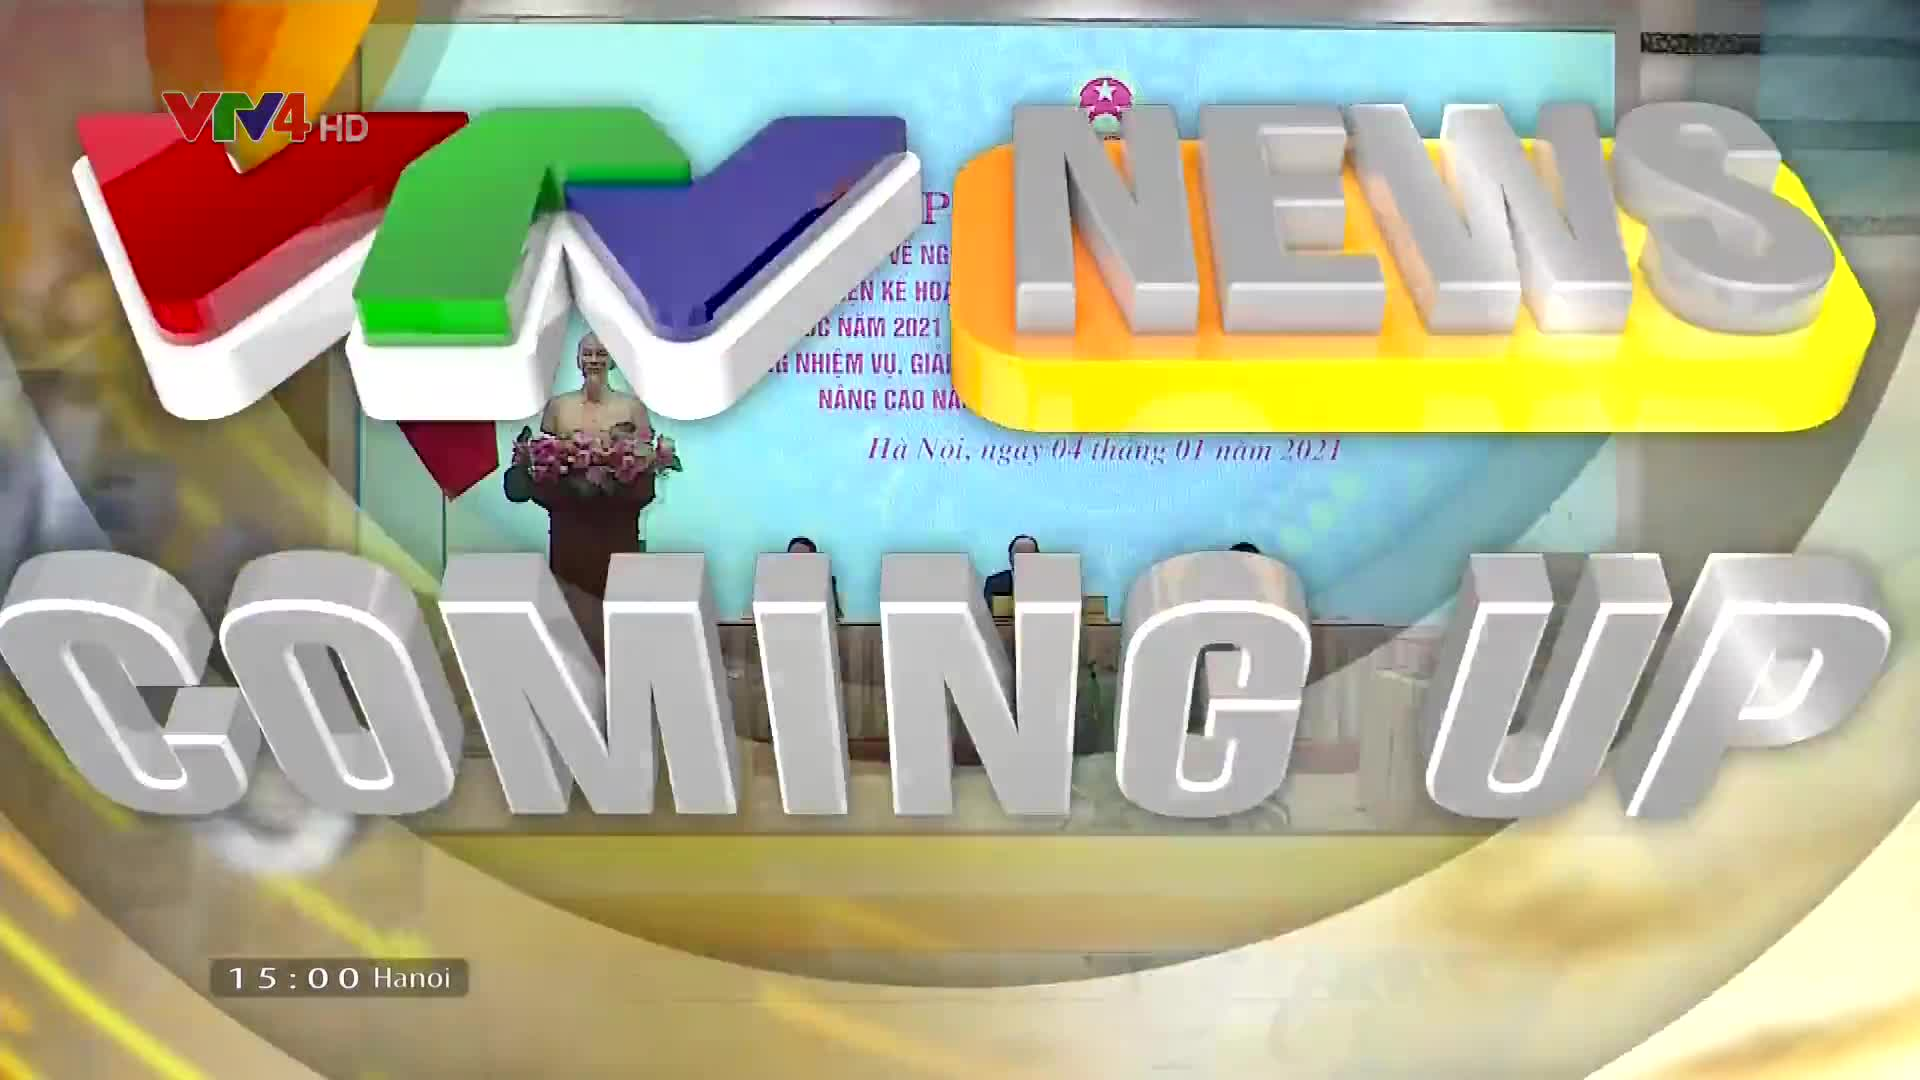 News 3 PM - 01/04/2021